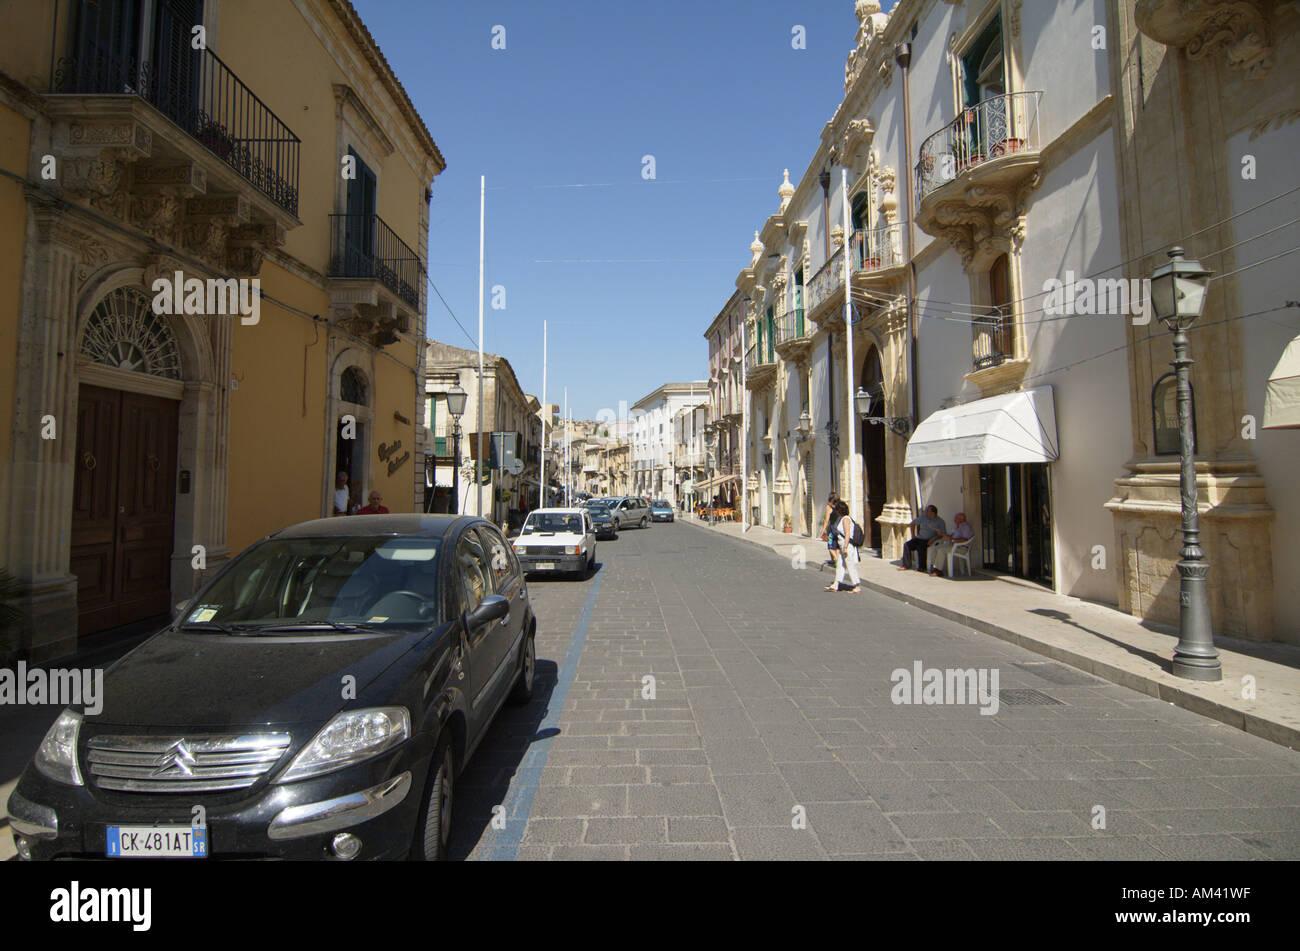 Palazzo Judaica palace of justice Palazzolo Acreide on the Monti Iblei Province of Syracuse Sicily Italy Stock Photo